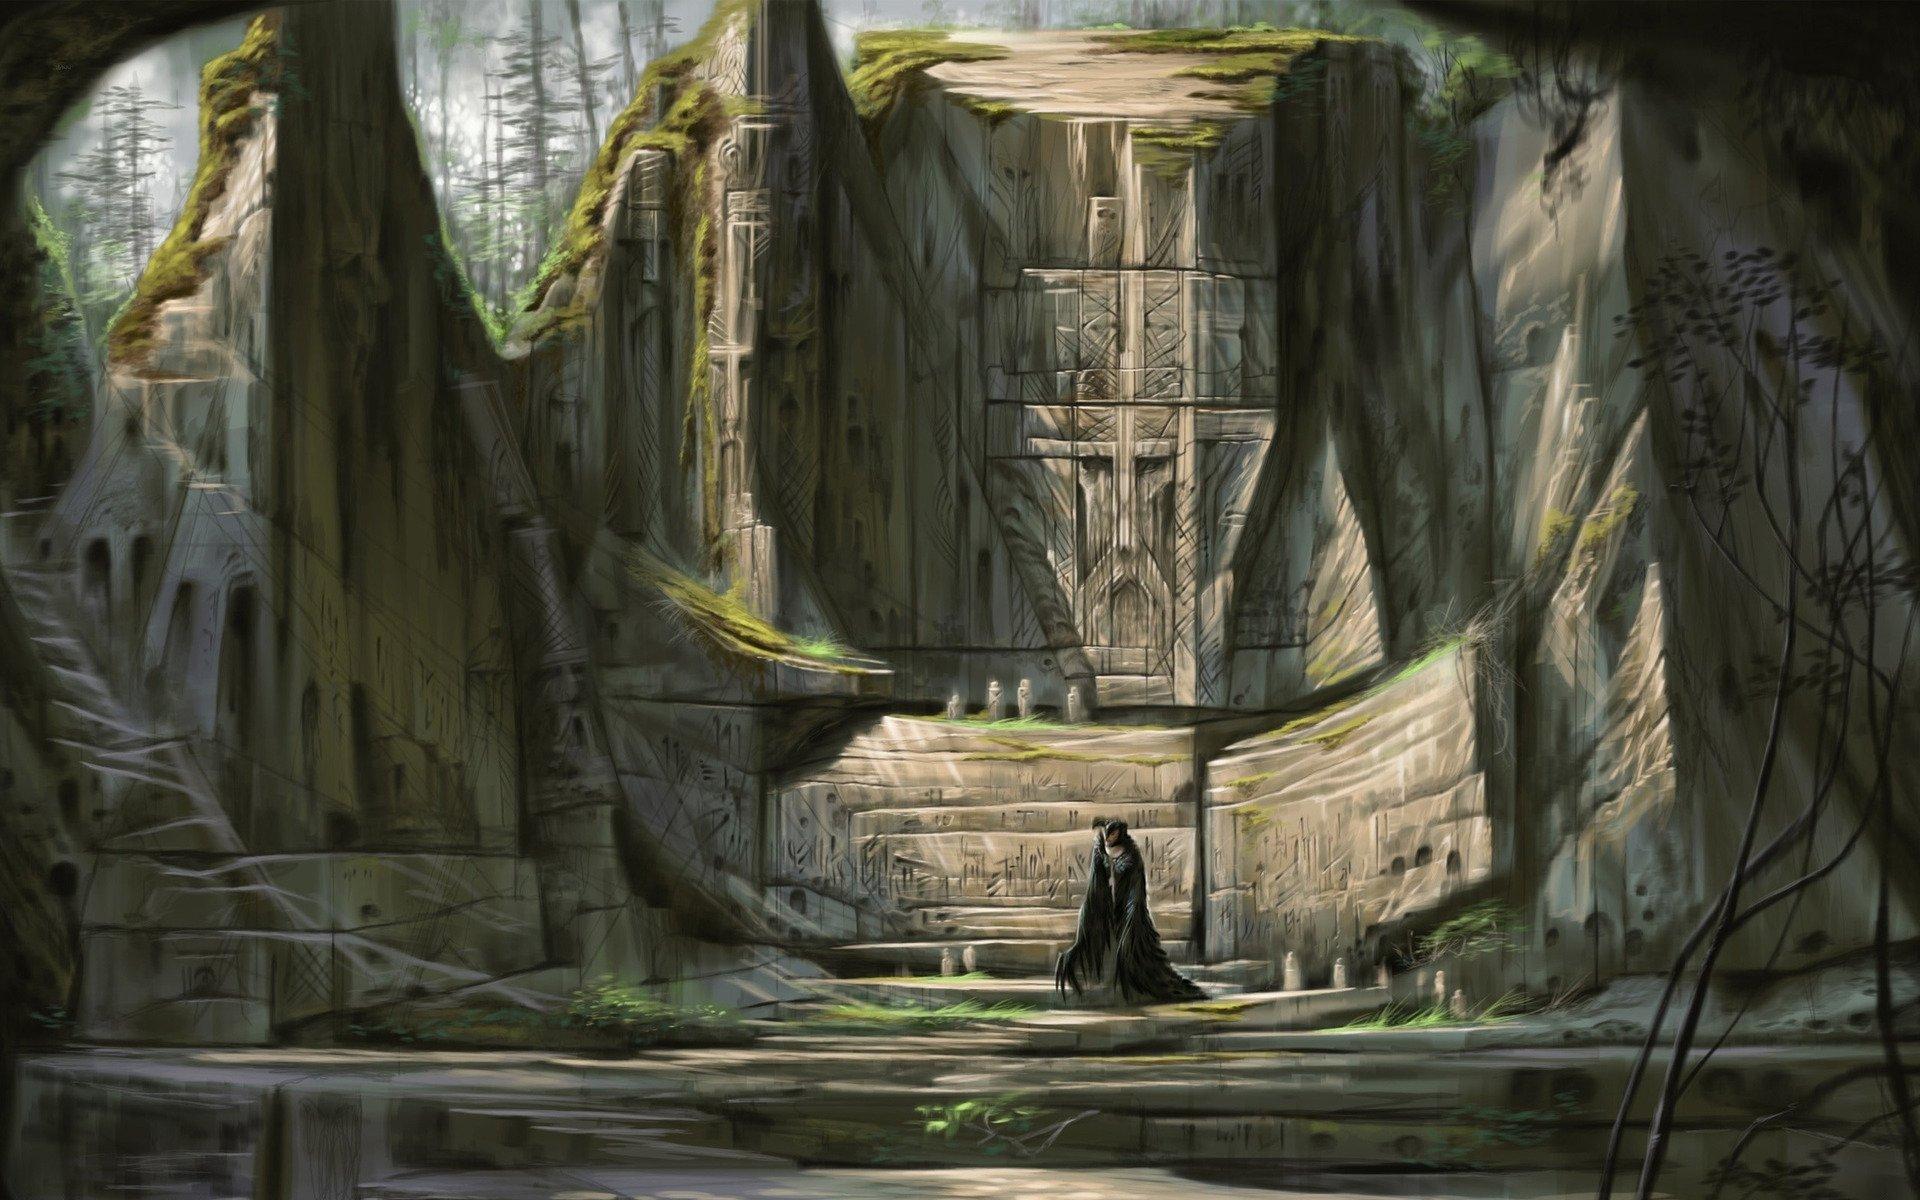 The Elder Scrolls V Skyrim Hd Wallpaper Background Image